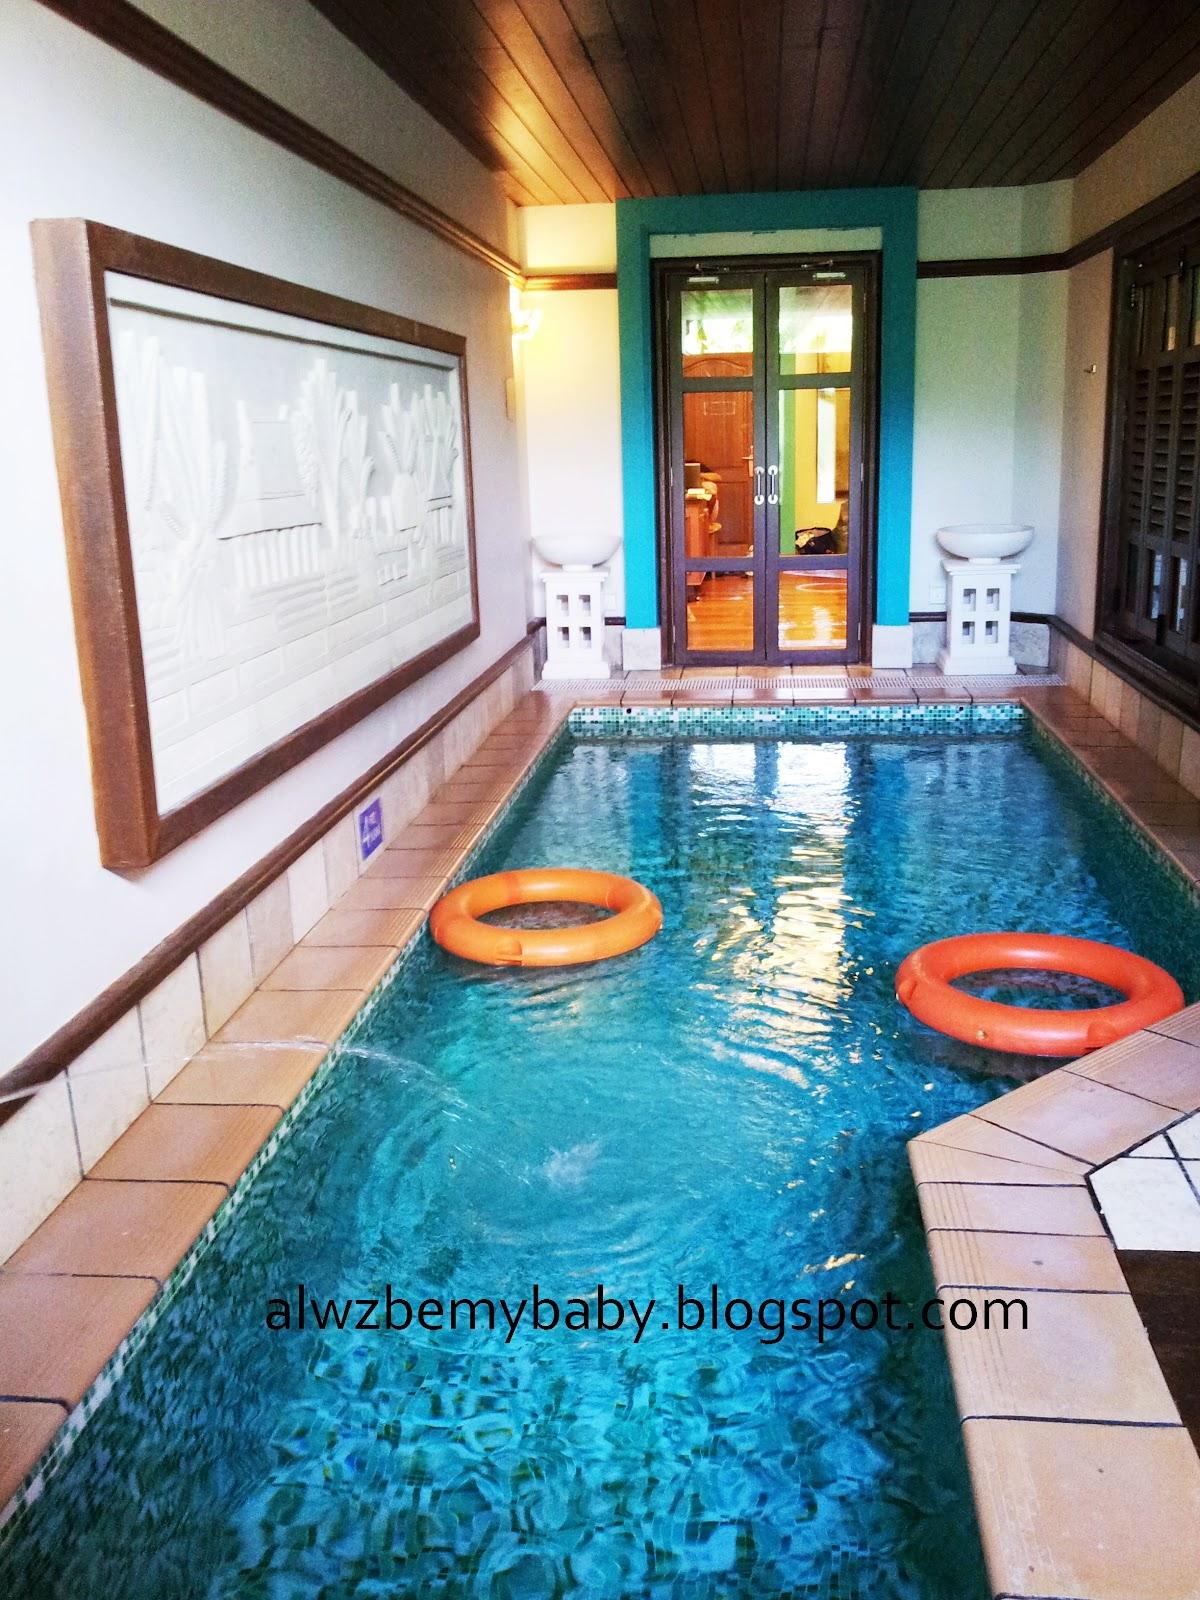 Alw z b3 my baby garden pool villa grand lexis port dickson for Garden pool villa grand lexis blog